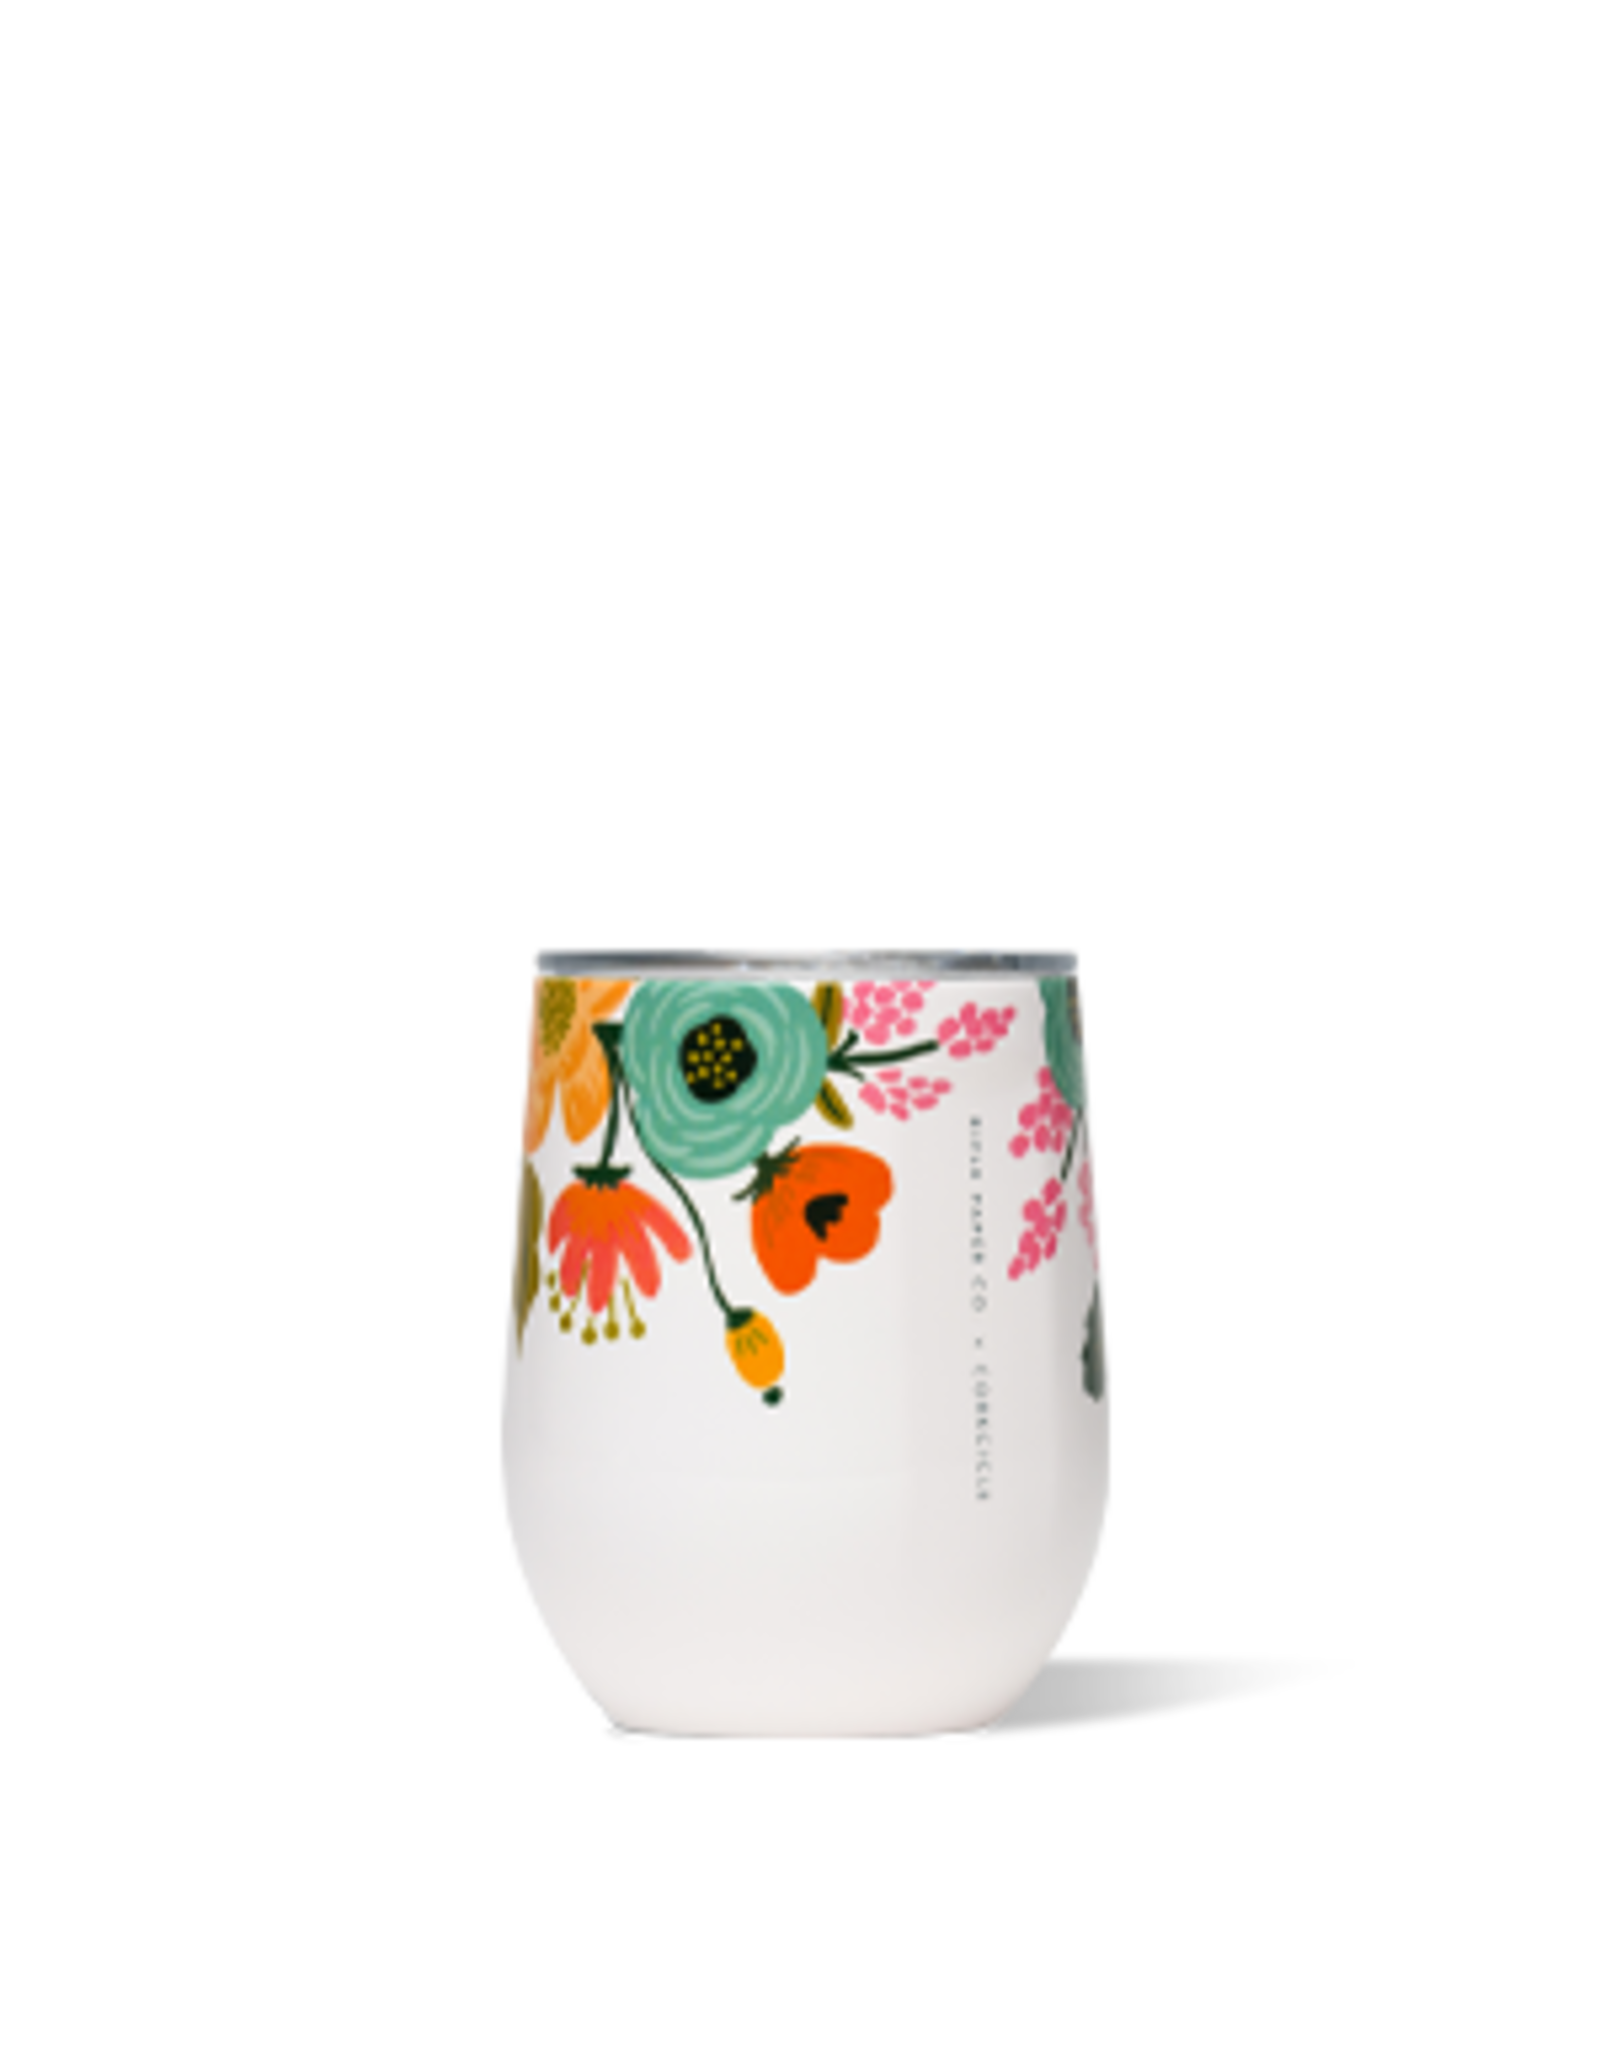 Corkcicle Stemless Tumbler, Lively Floral Cream, 12 oz.